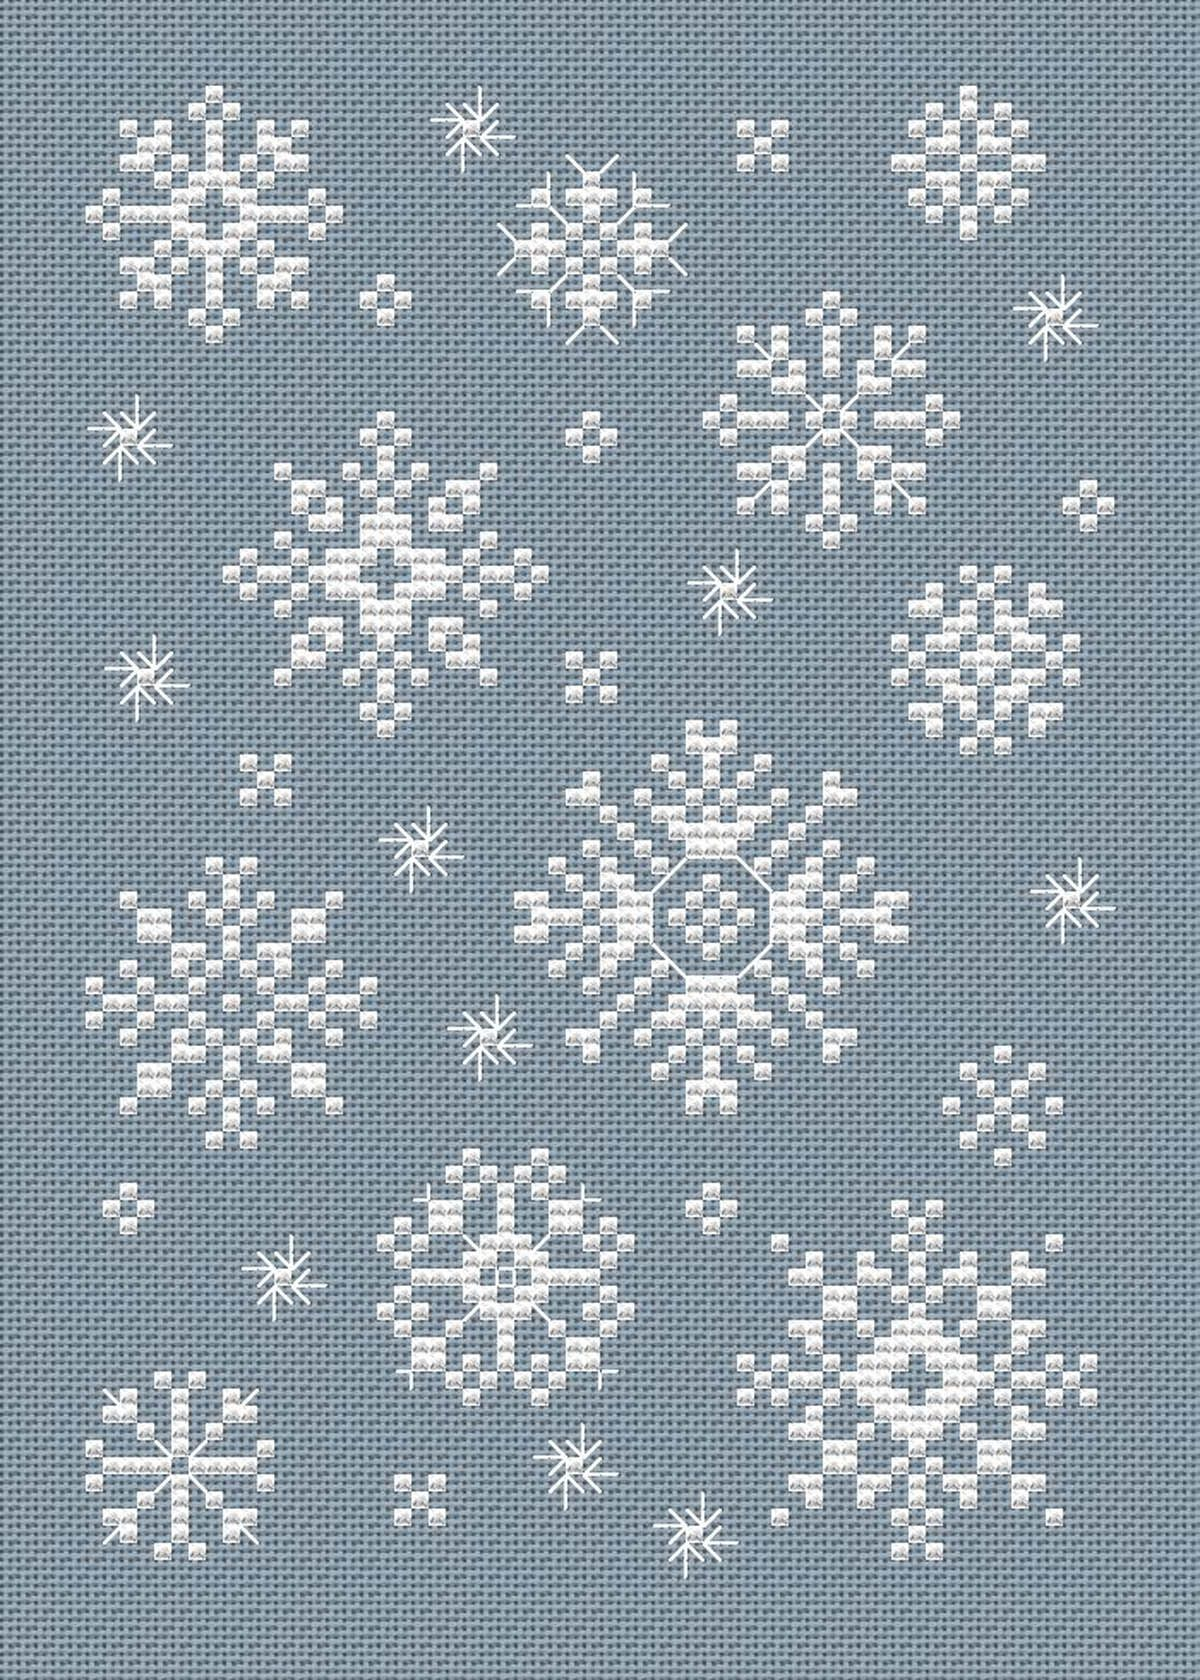 Snowflakes Cross Stitch Chart